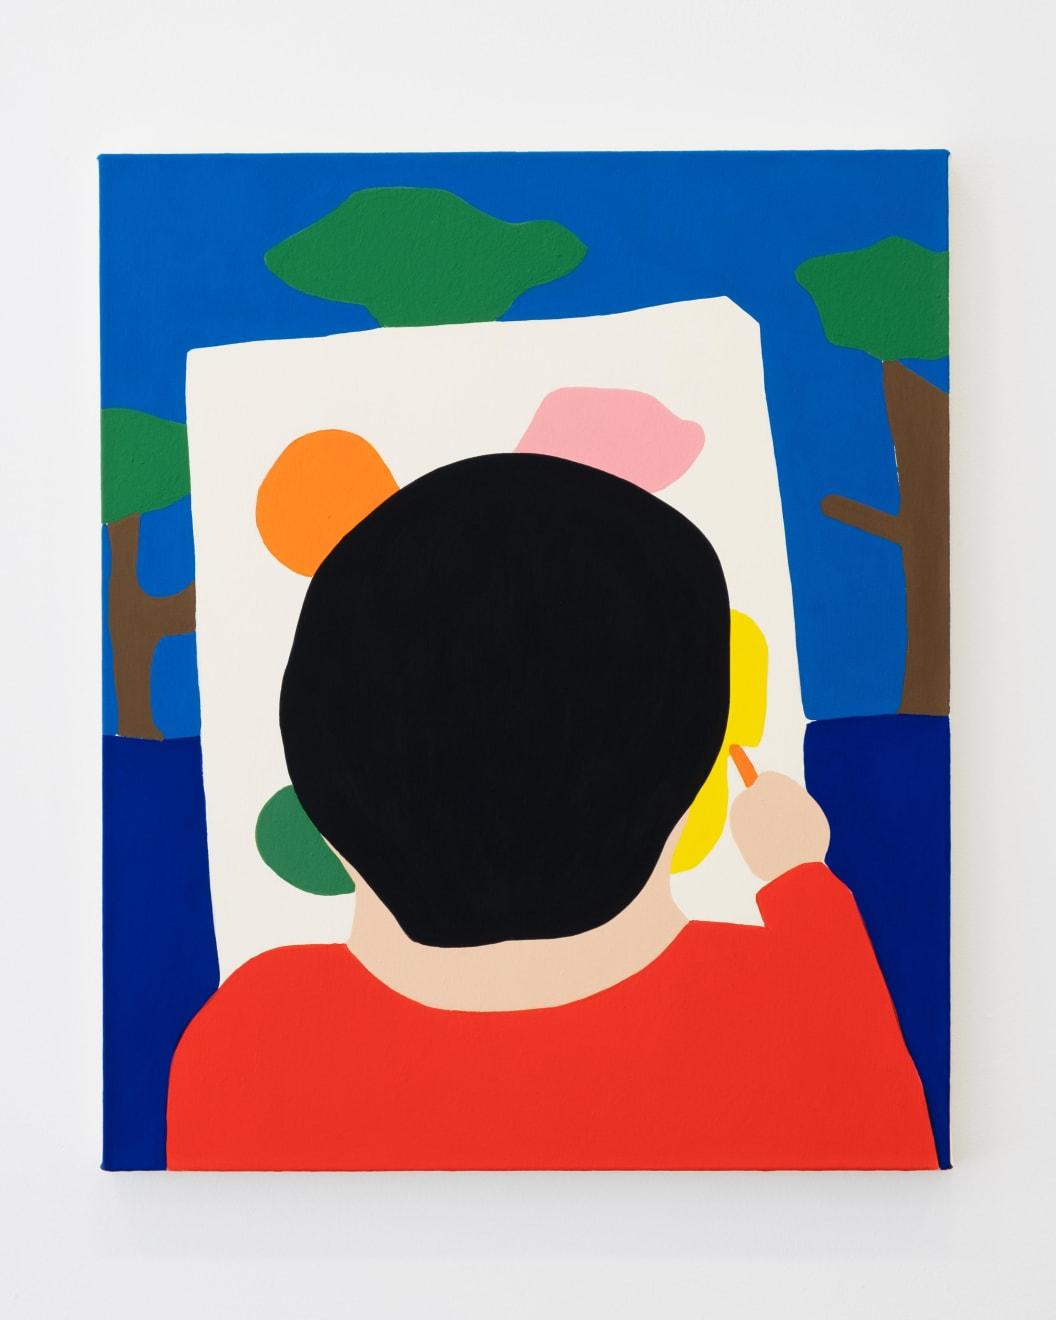 James Ulmer, Painter, 2021